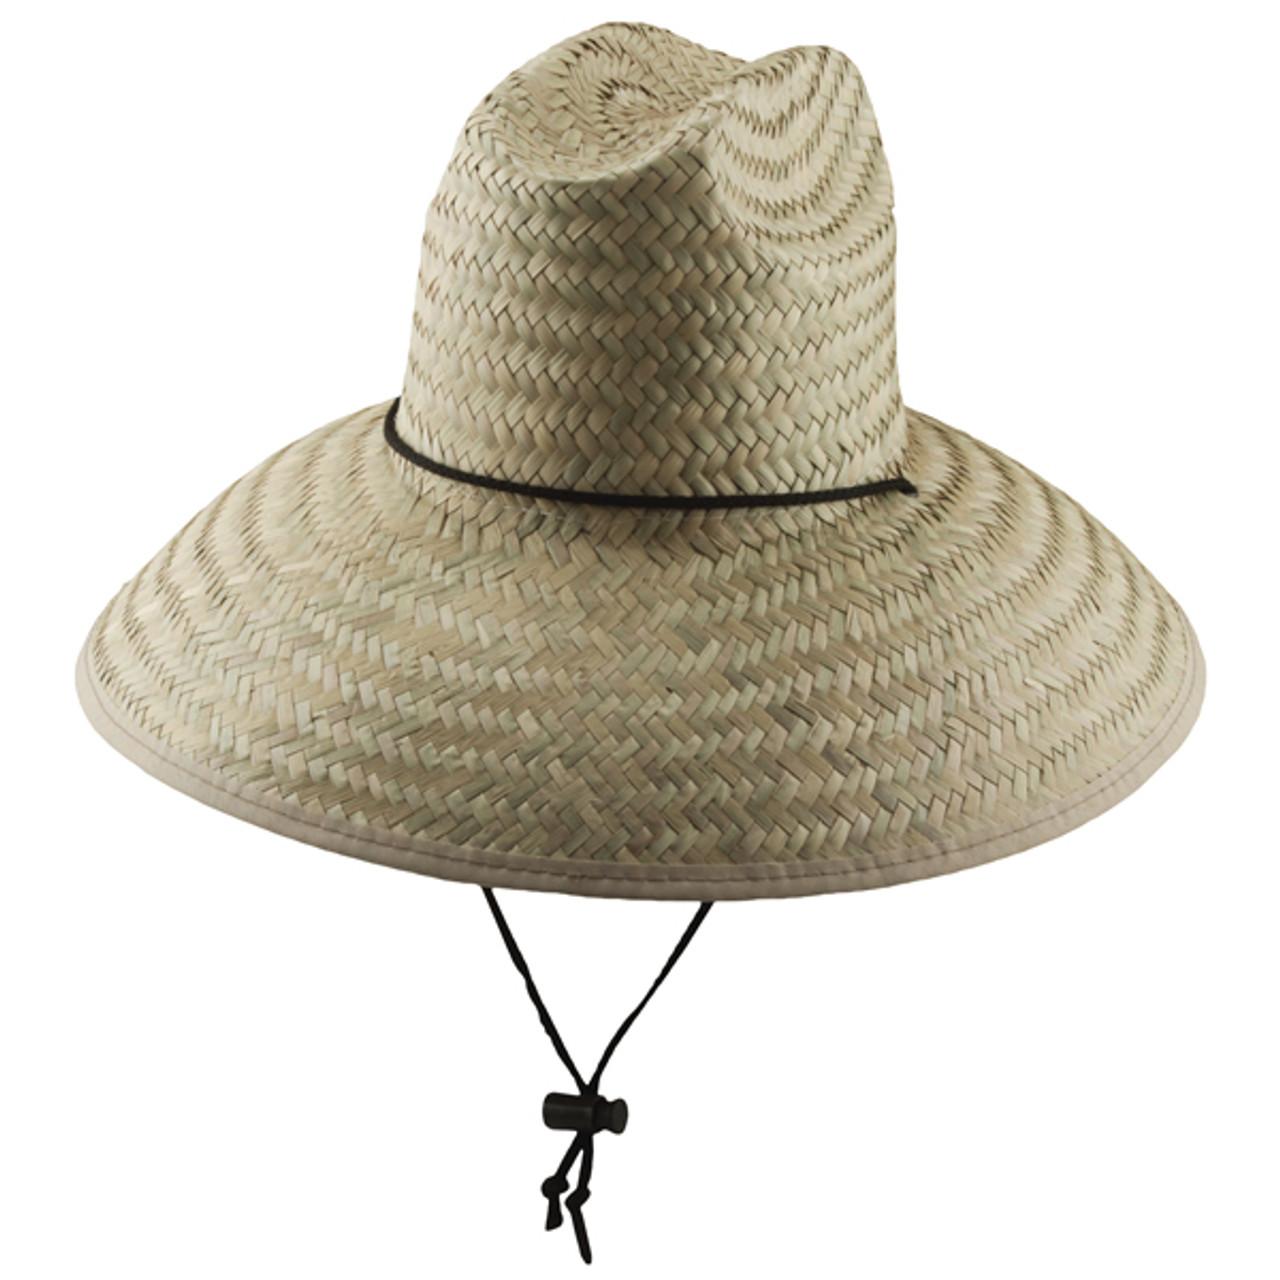 b0e5866f3 Dorfman Pacific - Palm Lifeguard Straw Sun Hat